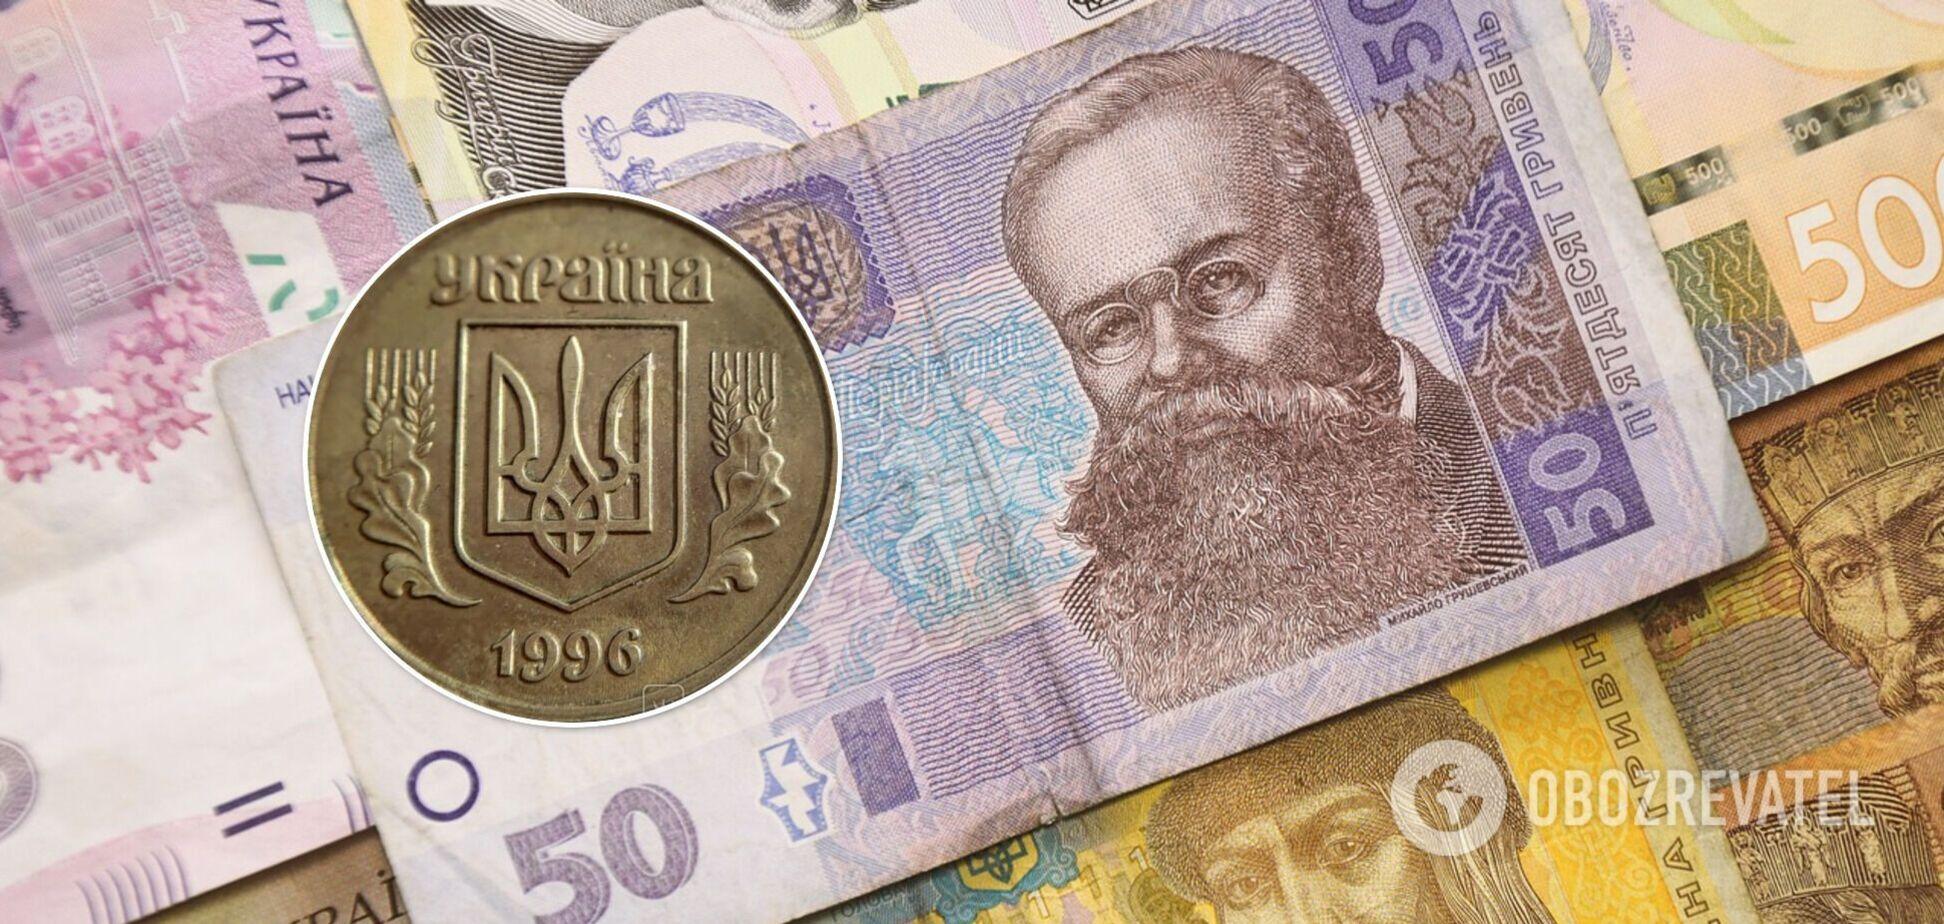 Монету в 50 копеек продают за тысячи гривен